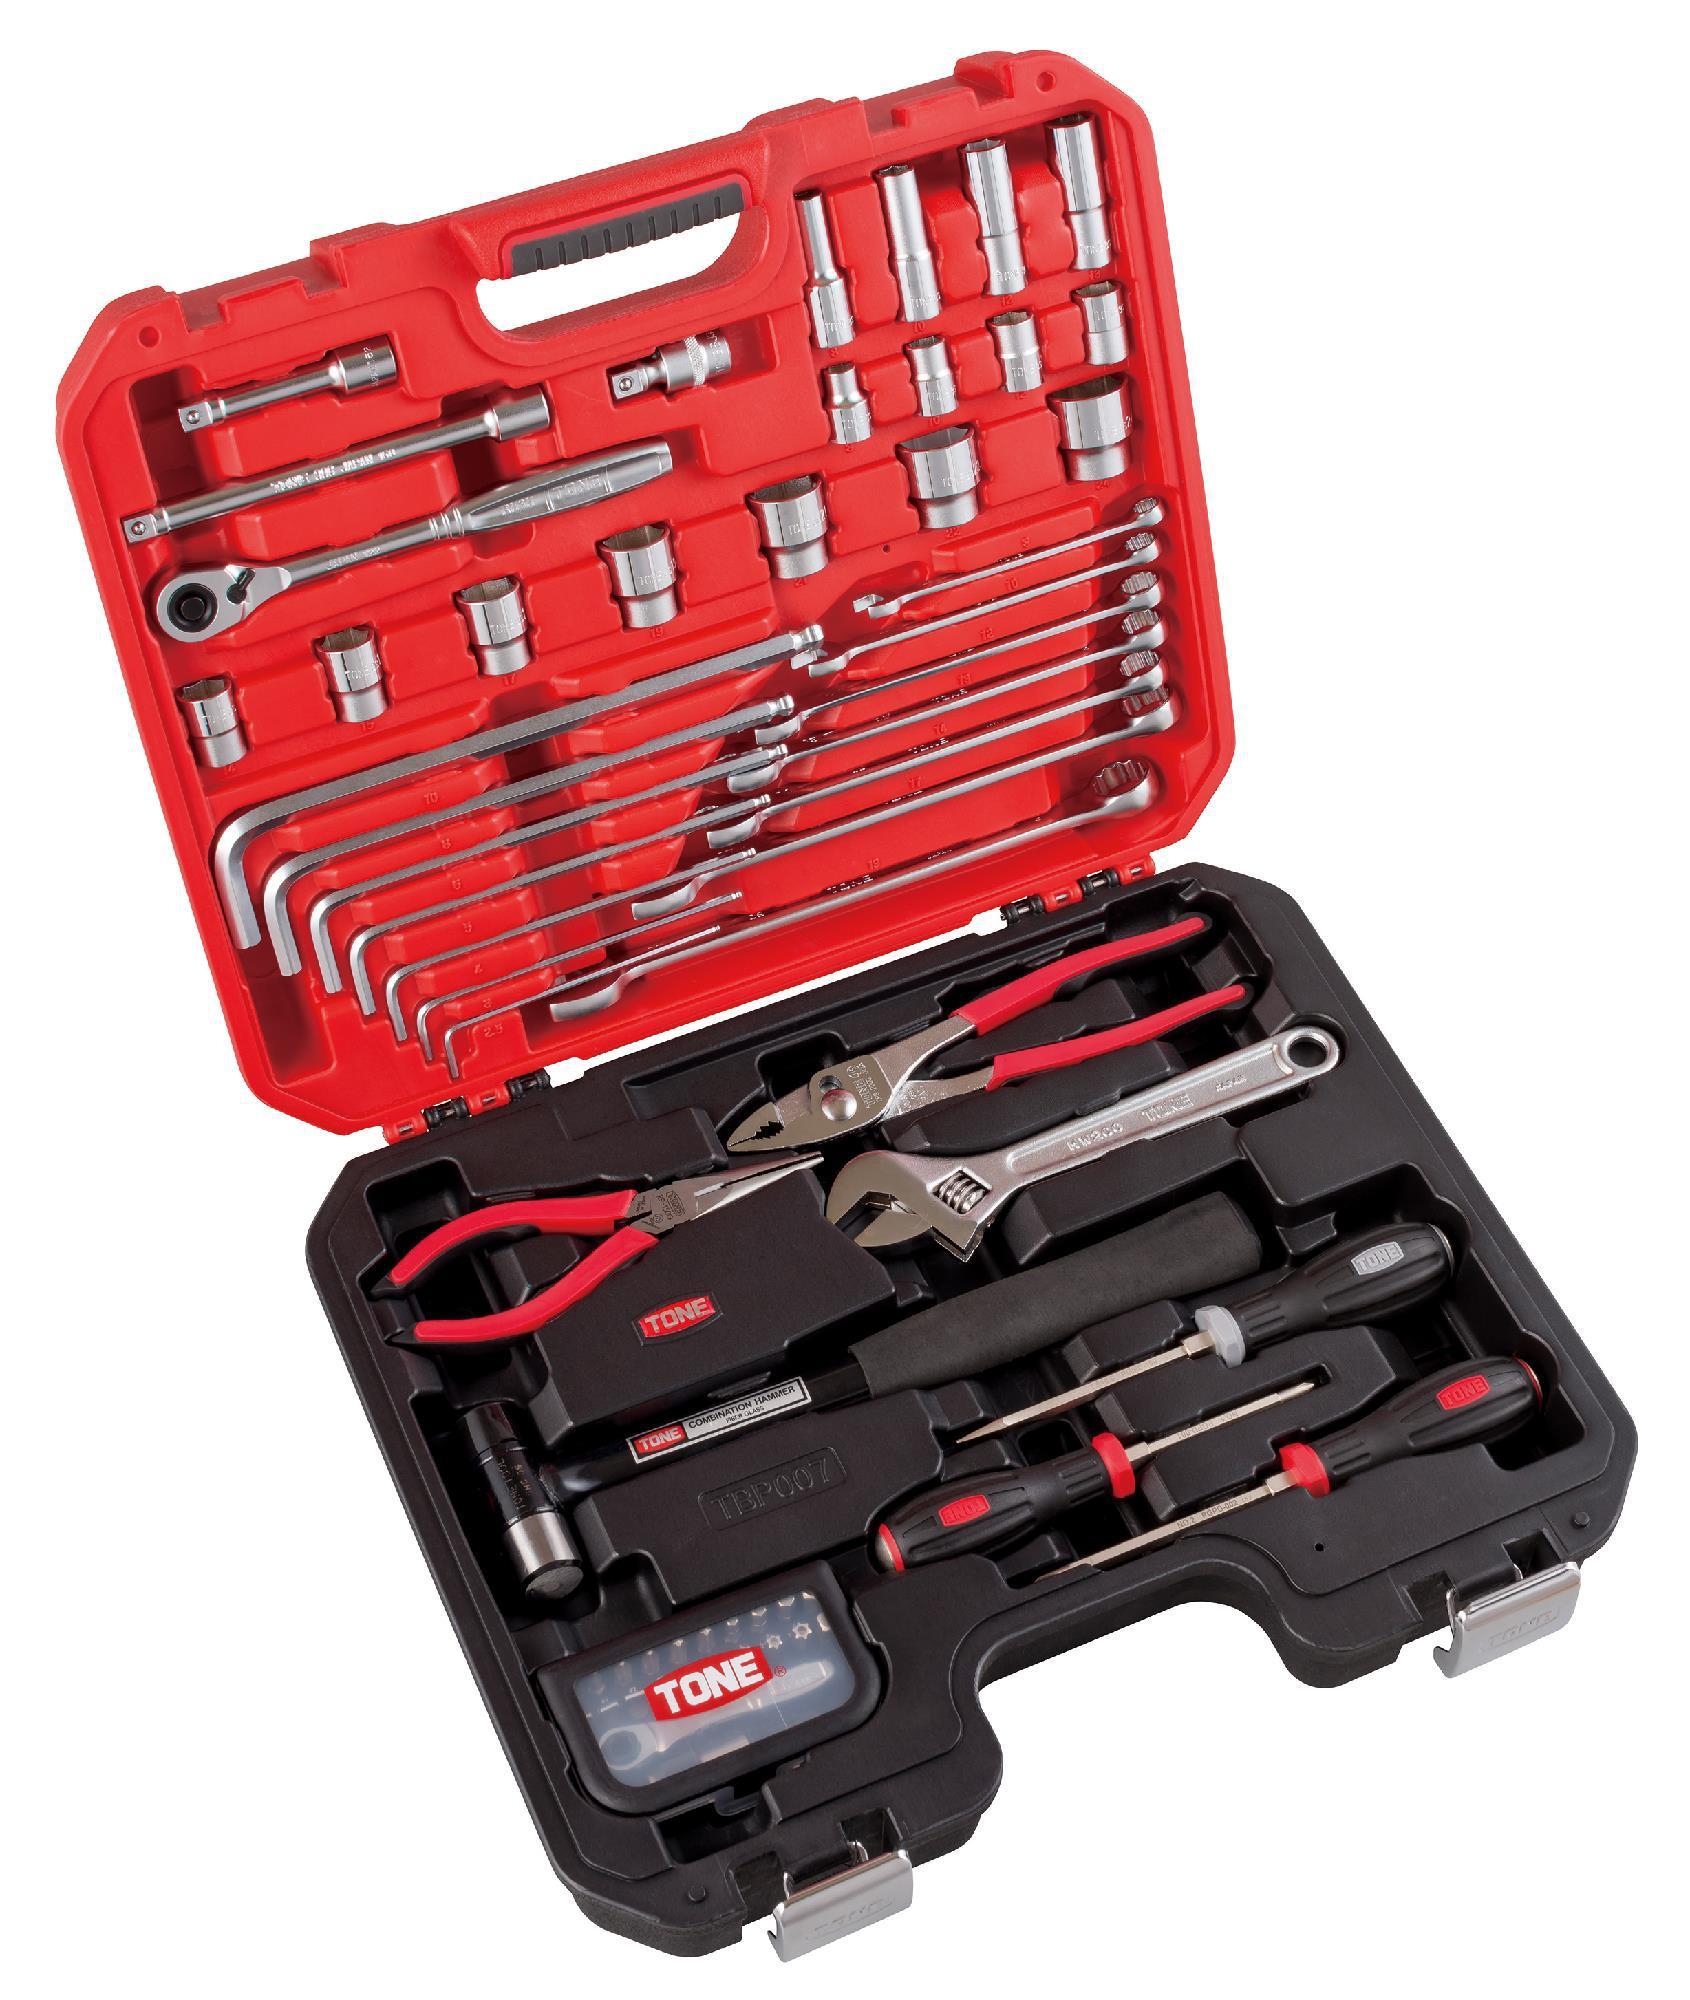 Cặp dụng cụ TONE 63 chi tiết K600